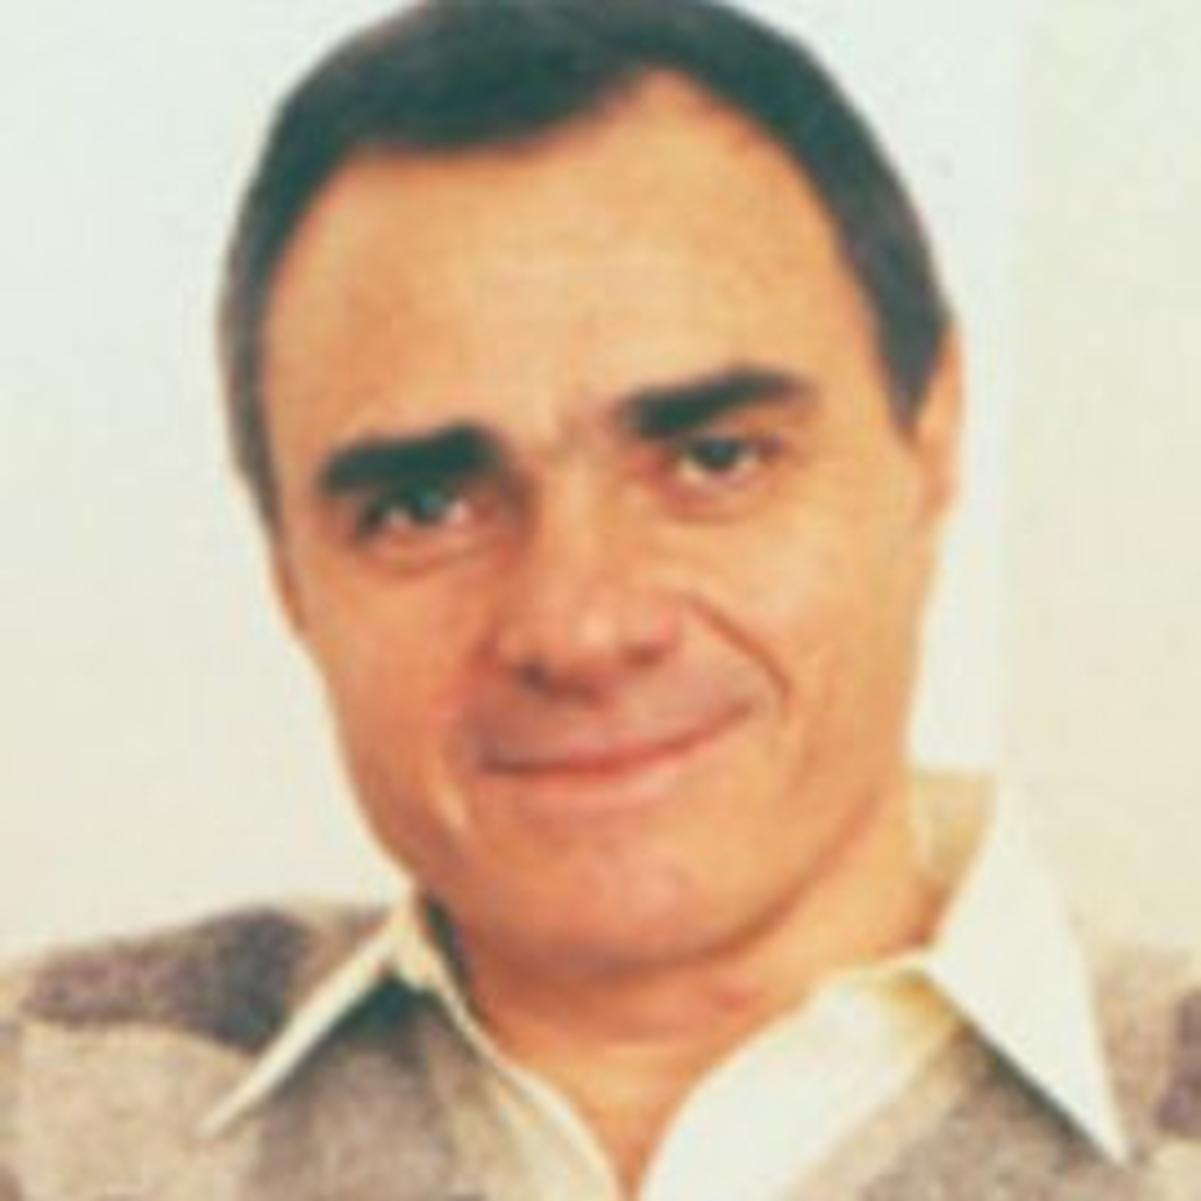 Stanley Turecki